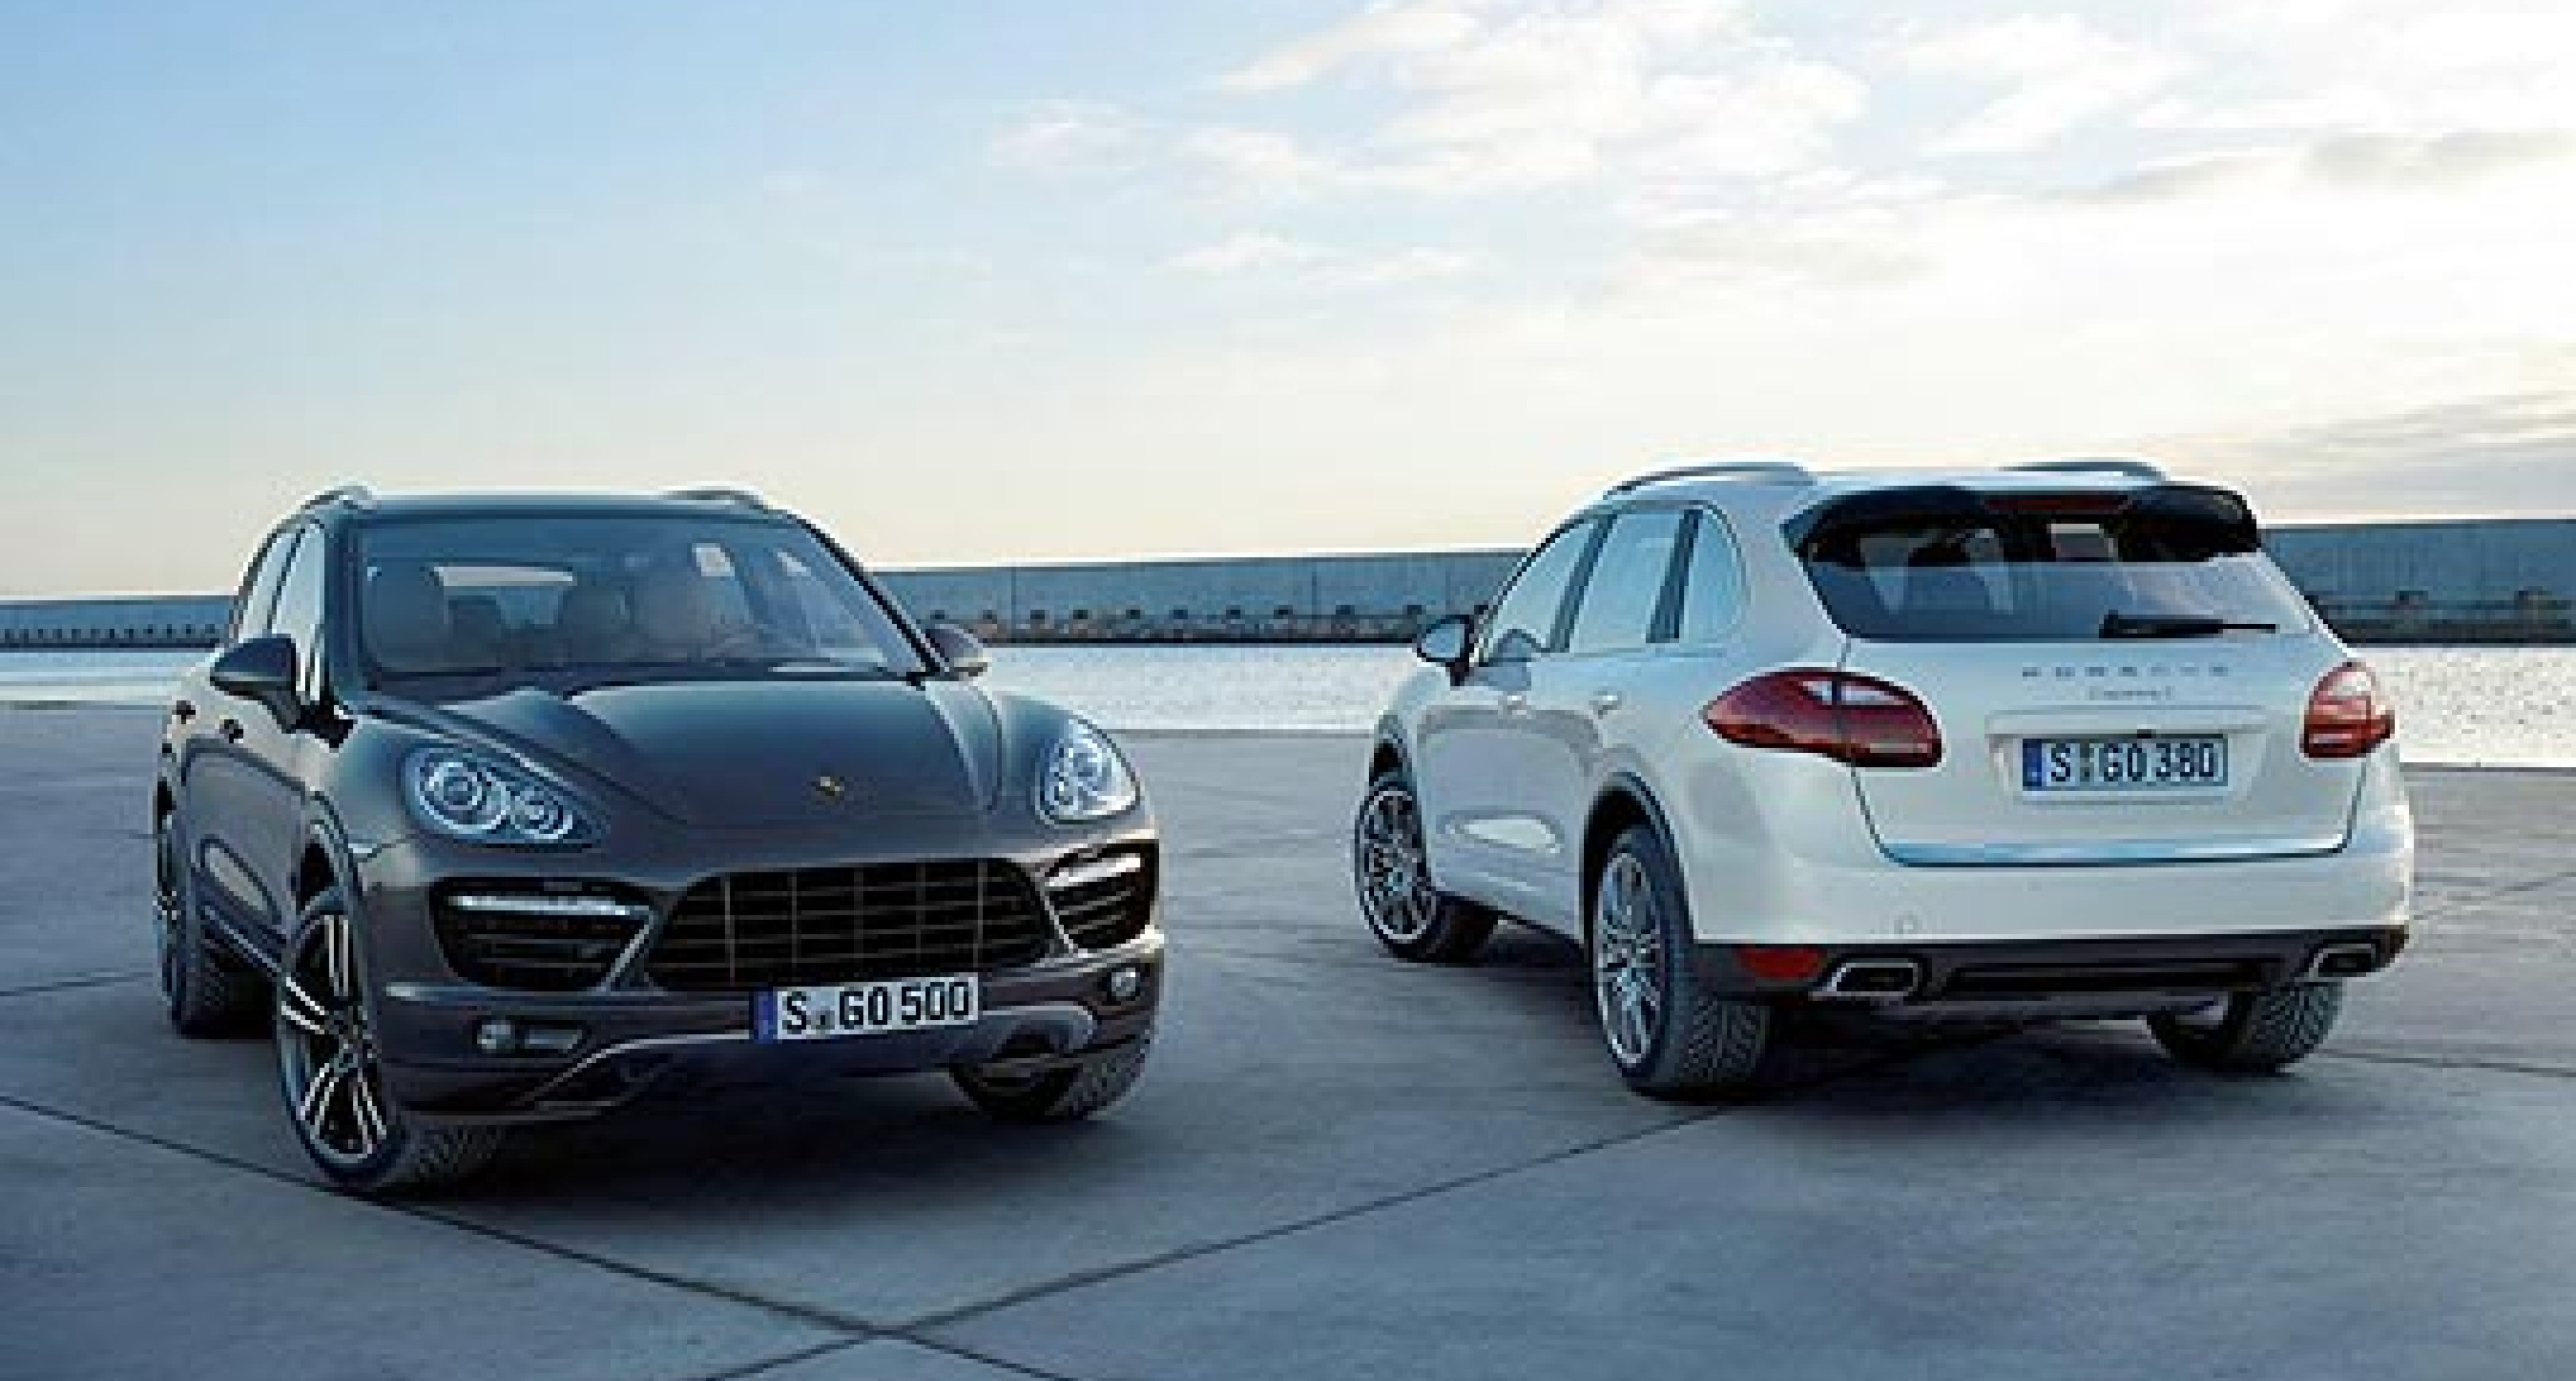 Geneva Preview: New Porsche Cayenne